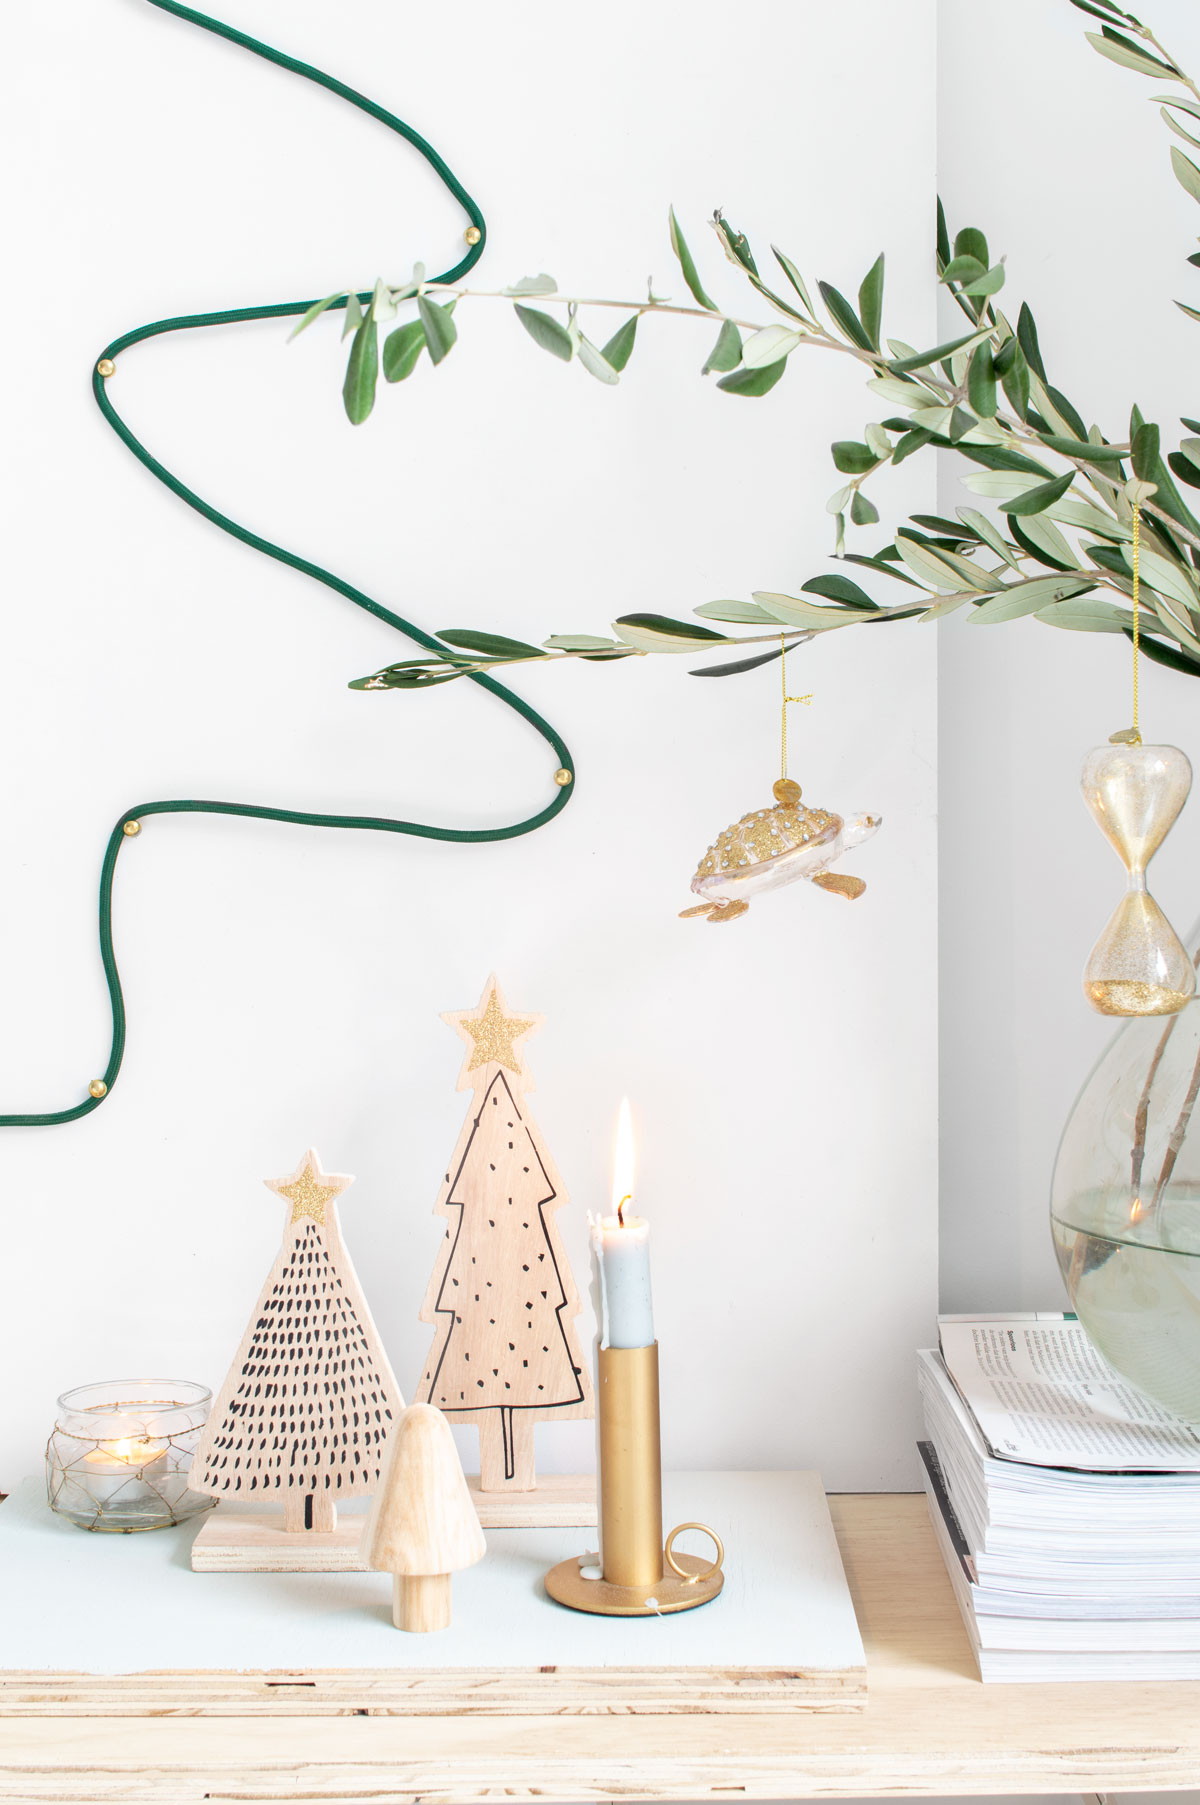 DIY kerst feestdagen